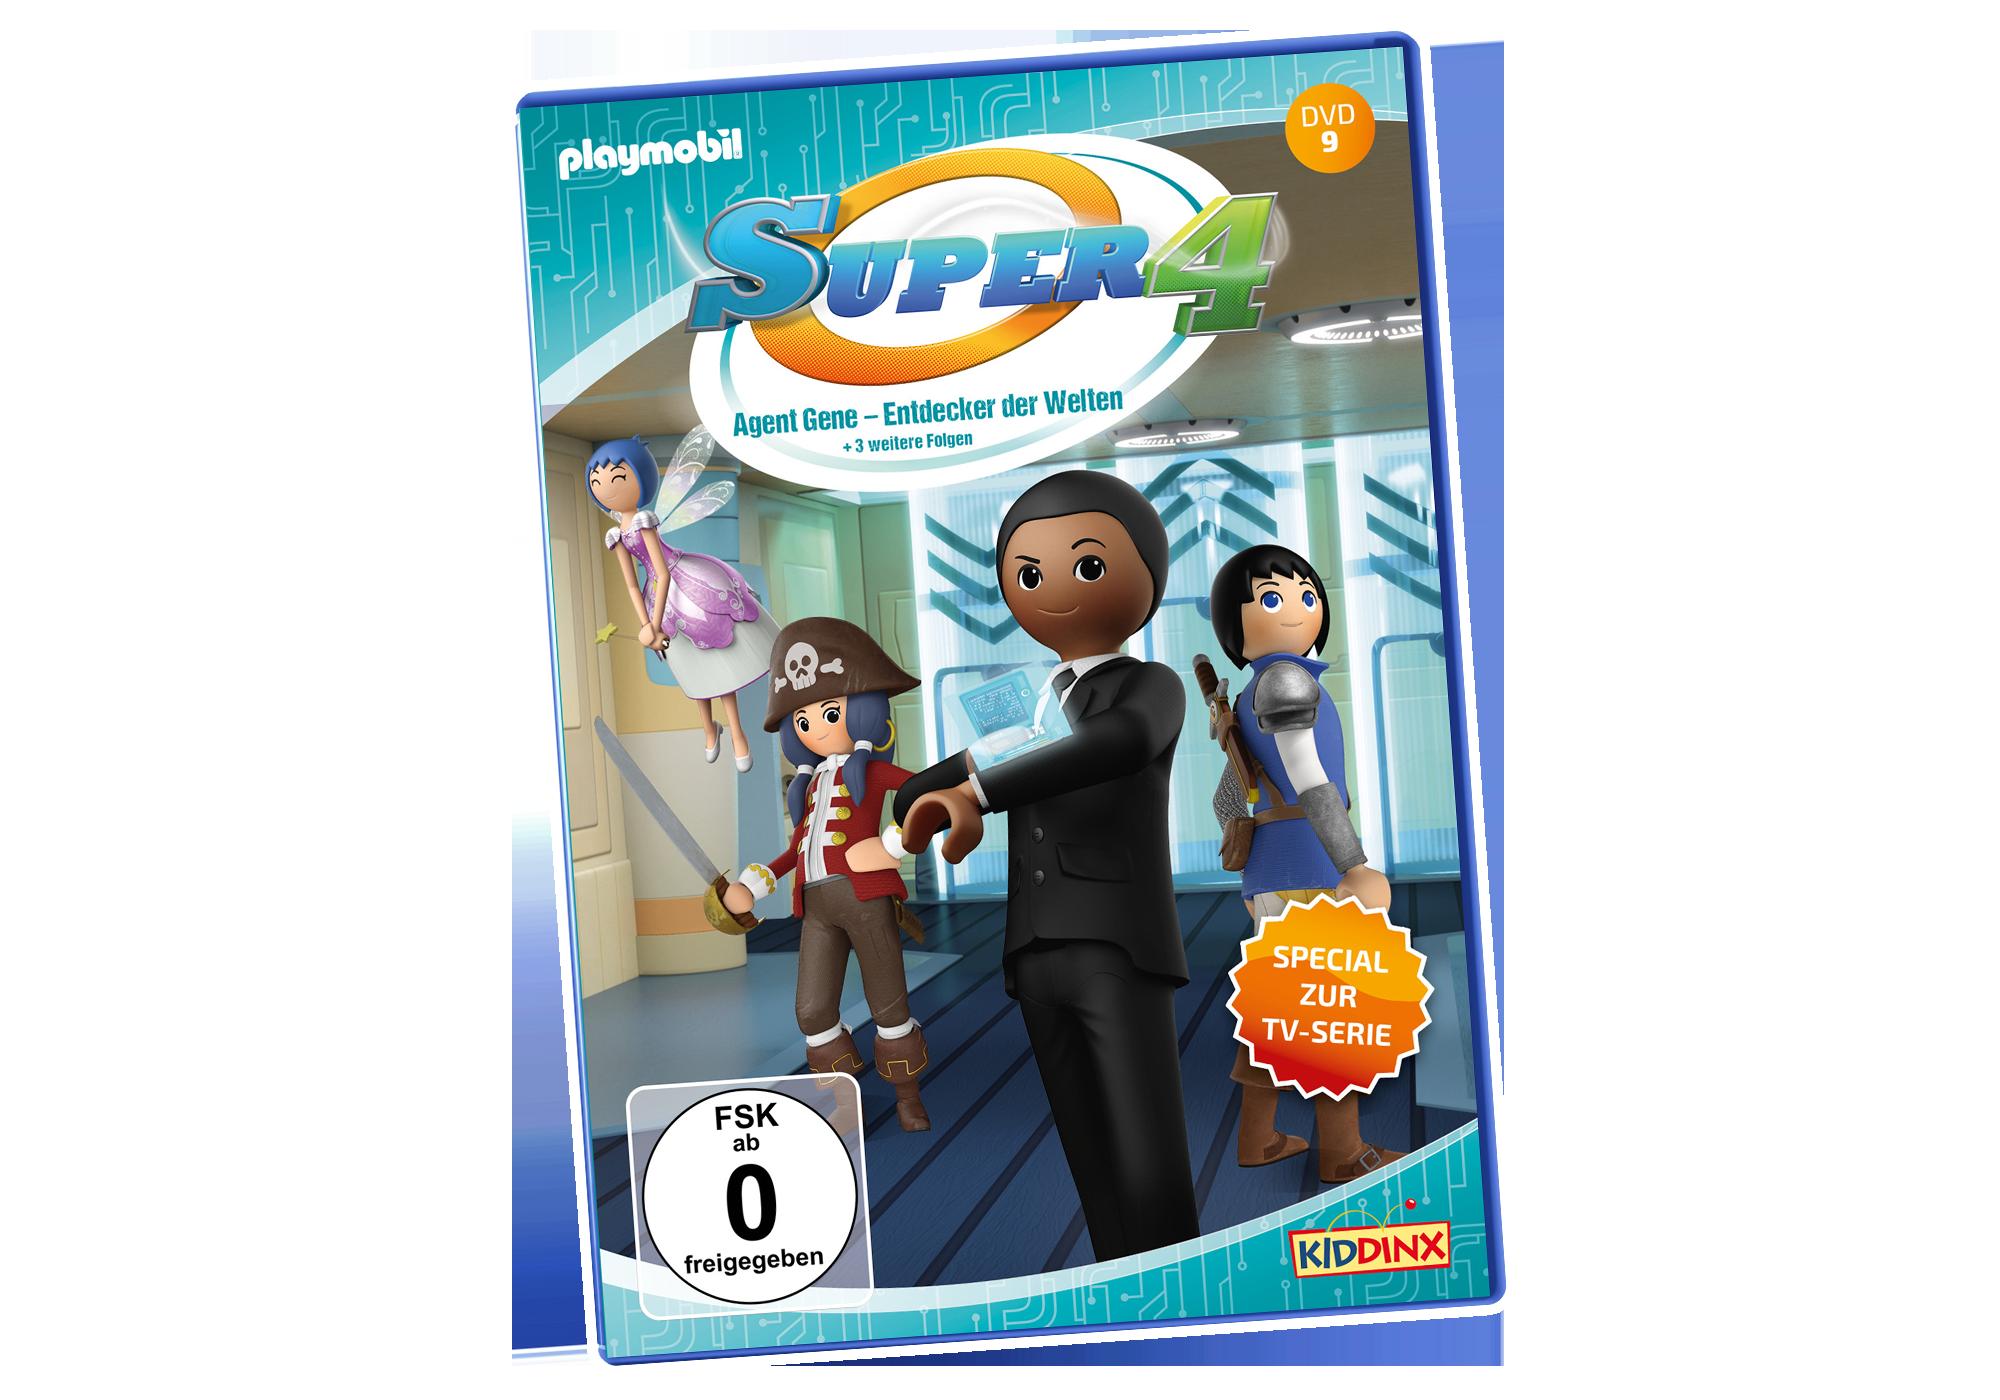 http://media.playmobil.com/i/playmobil/80021_product_detail